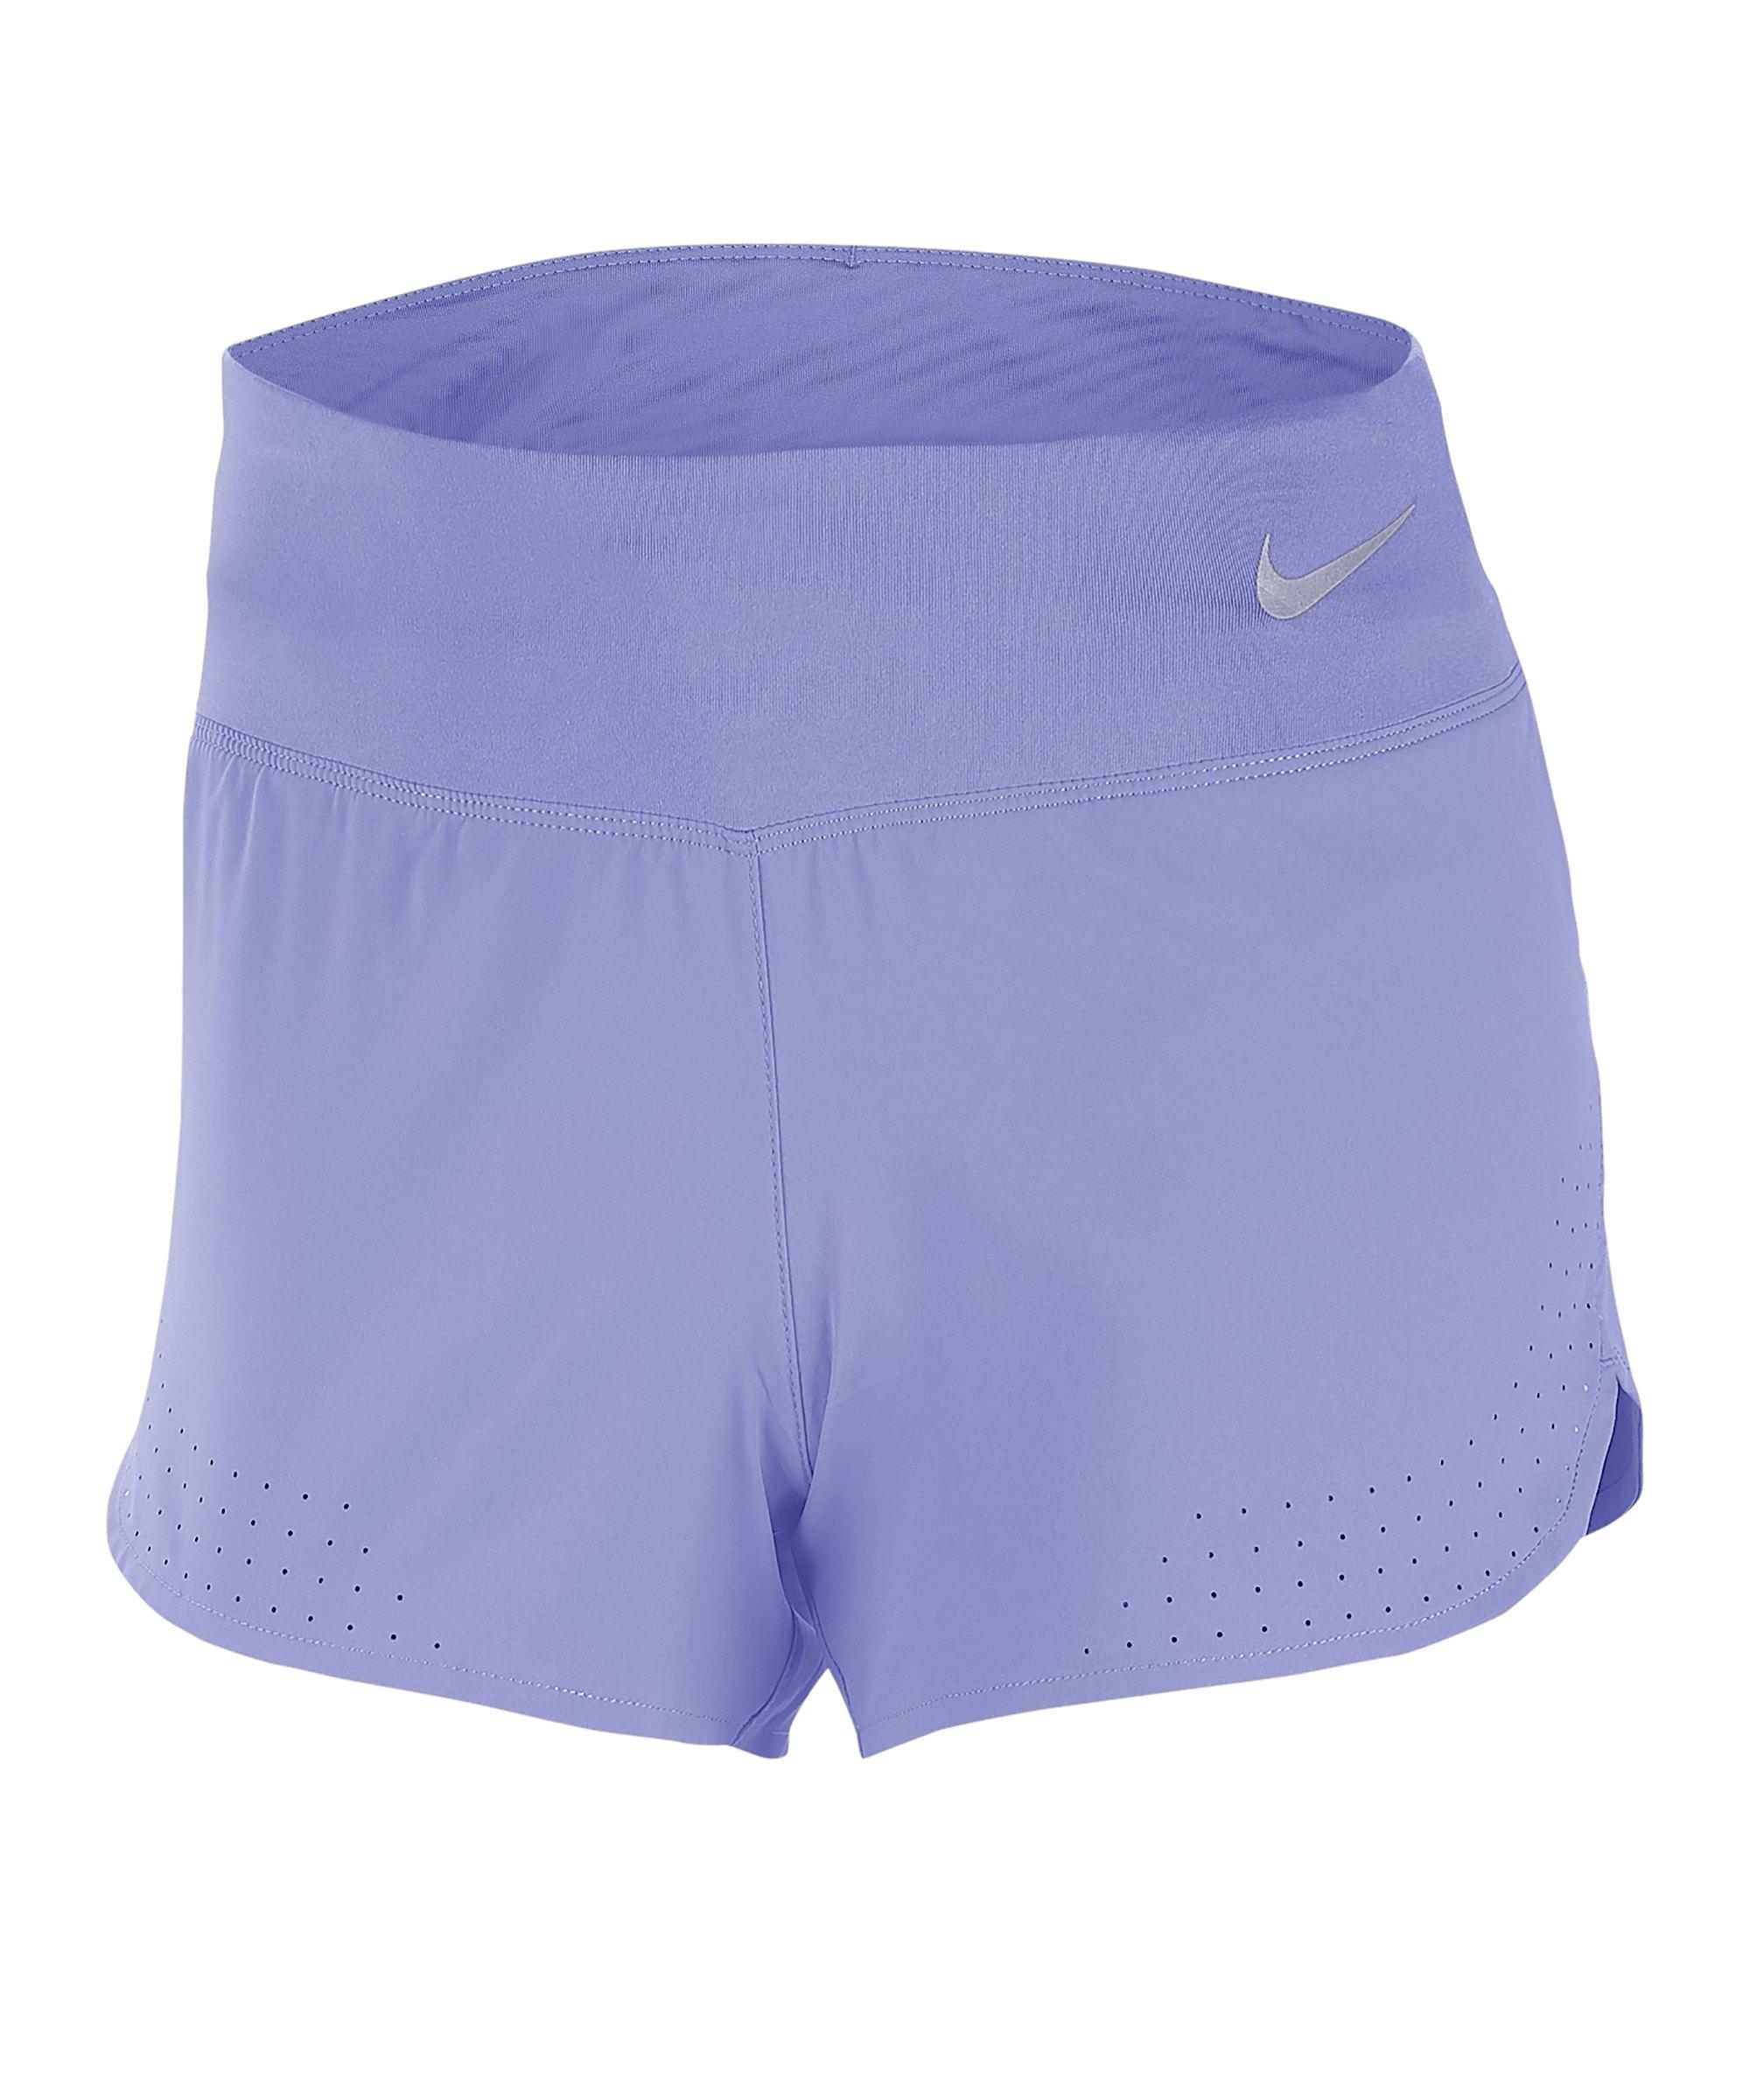 Nike Eclipse 3 Short Running Damen Grau F569 - grau